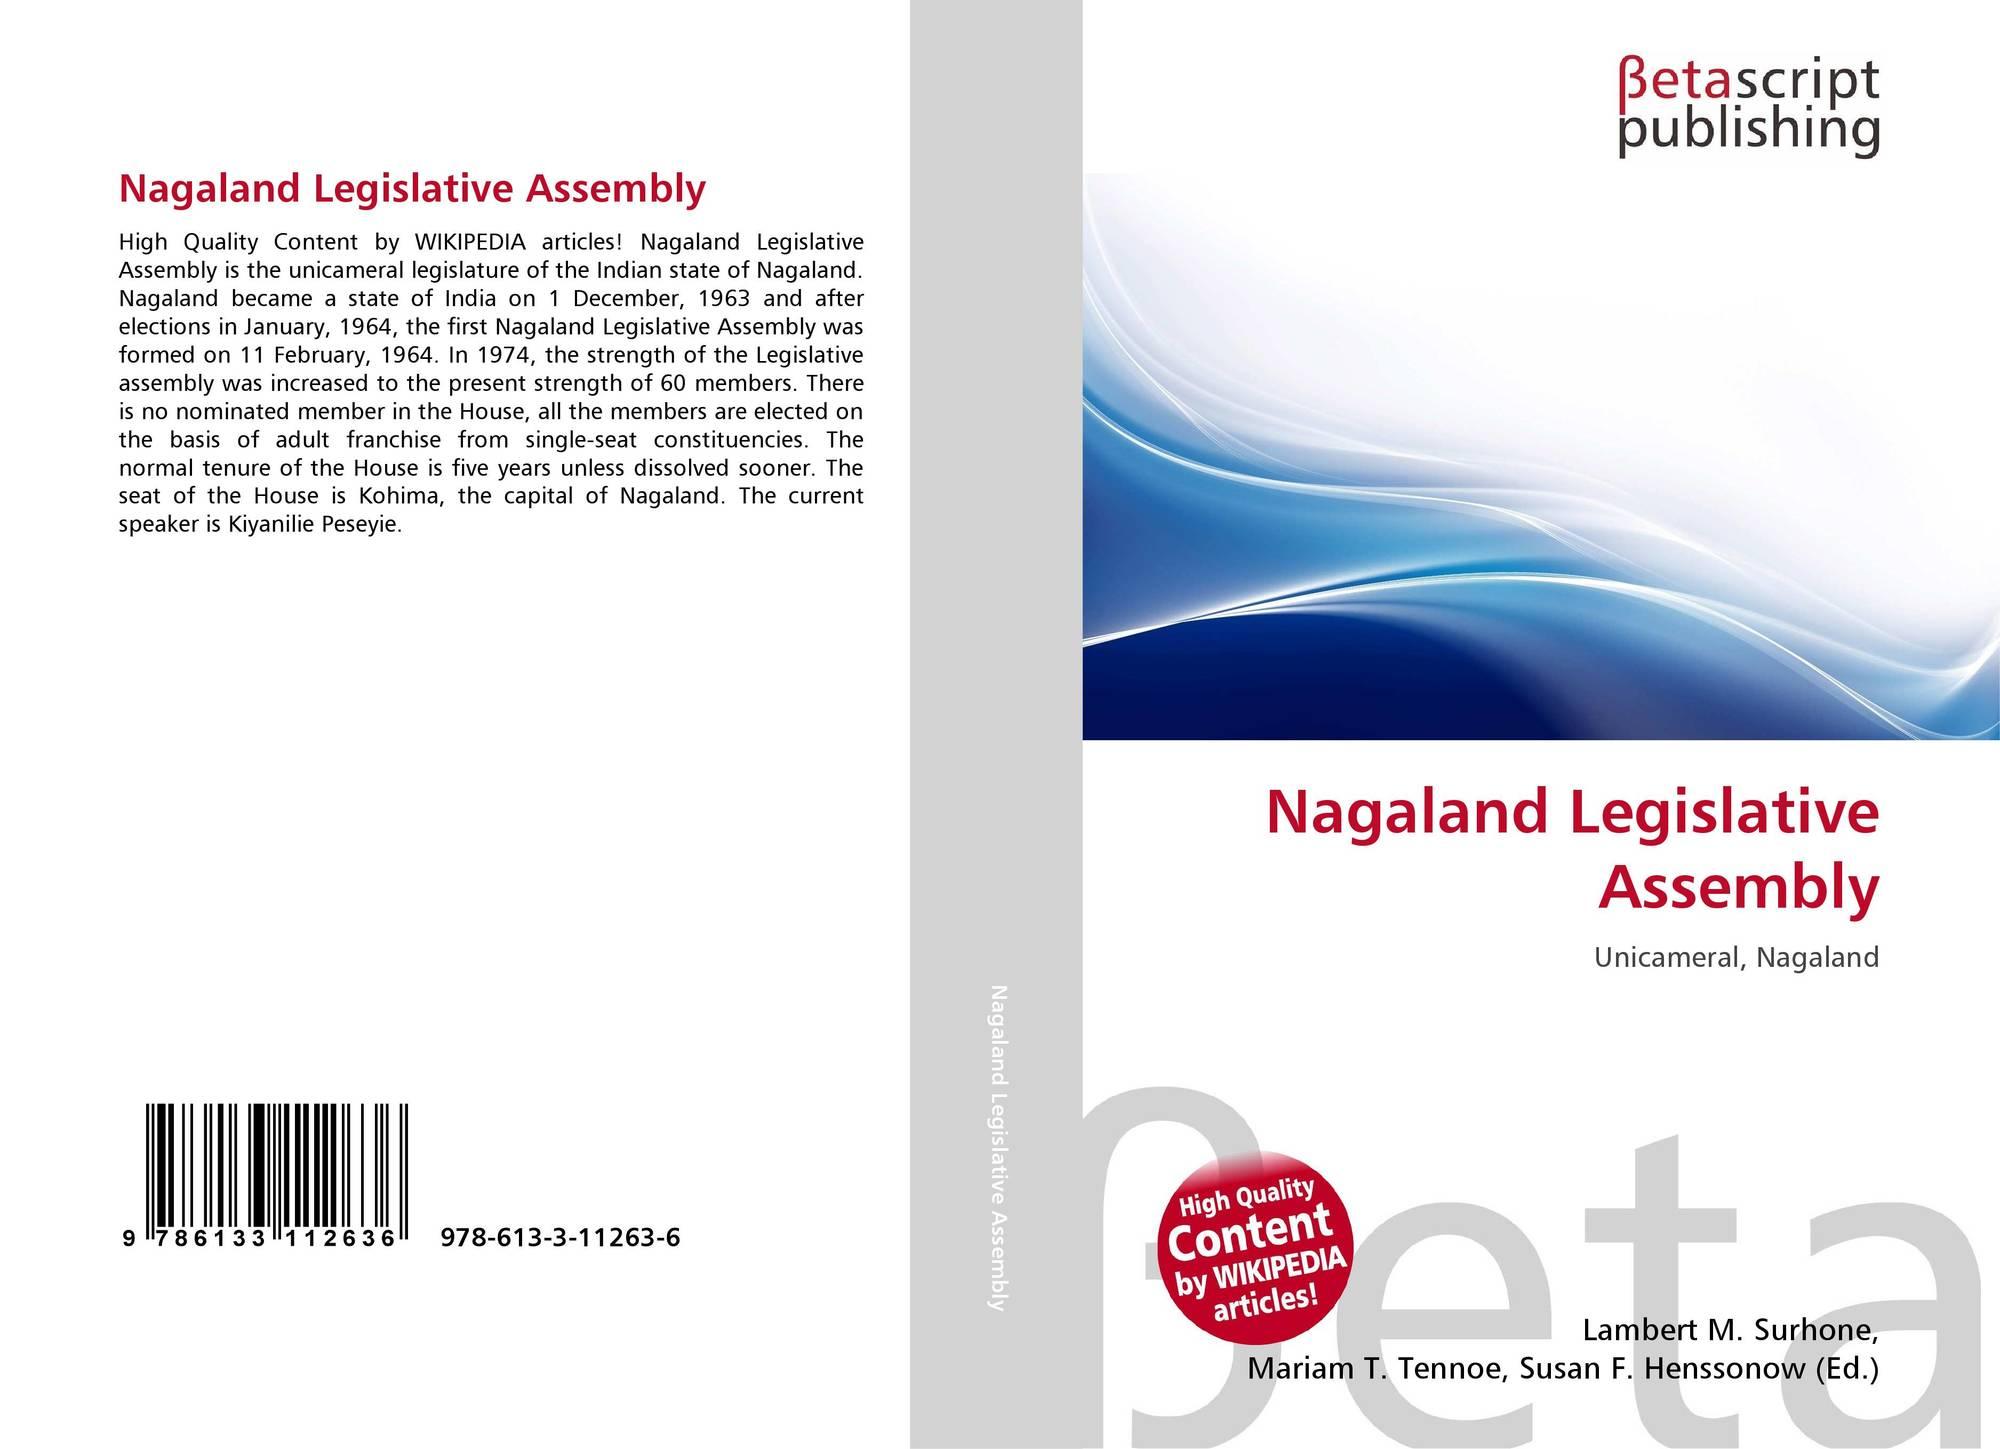 Nagaland Legislative Assembly, 978-613-3-11263-6, 6133112638